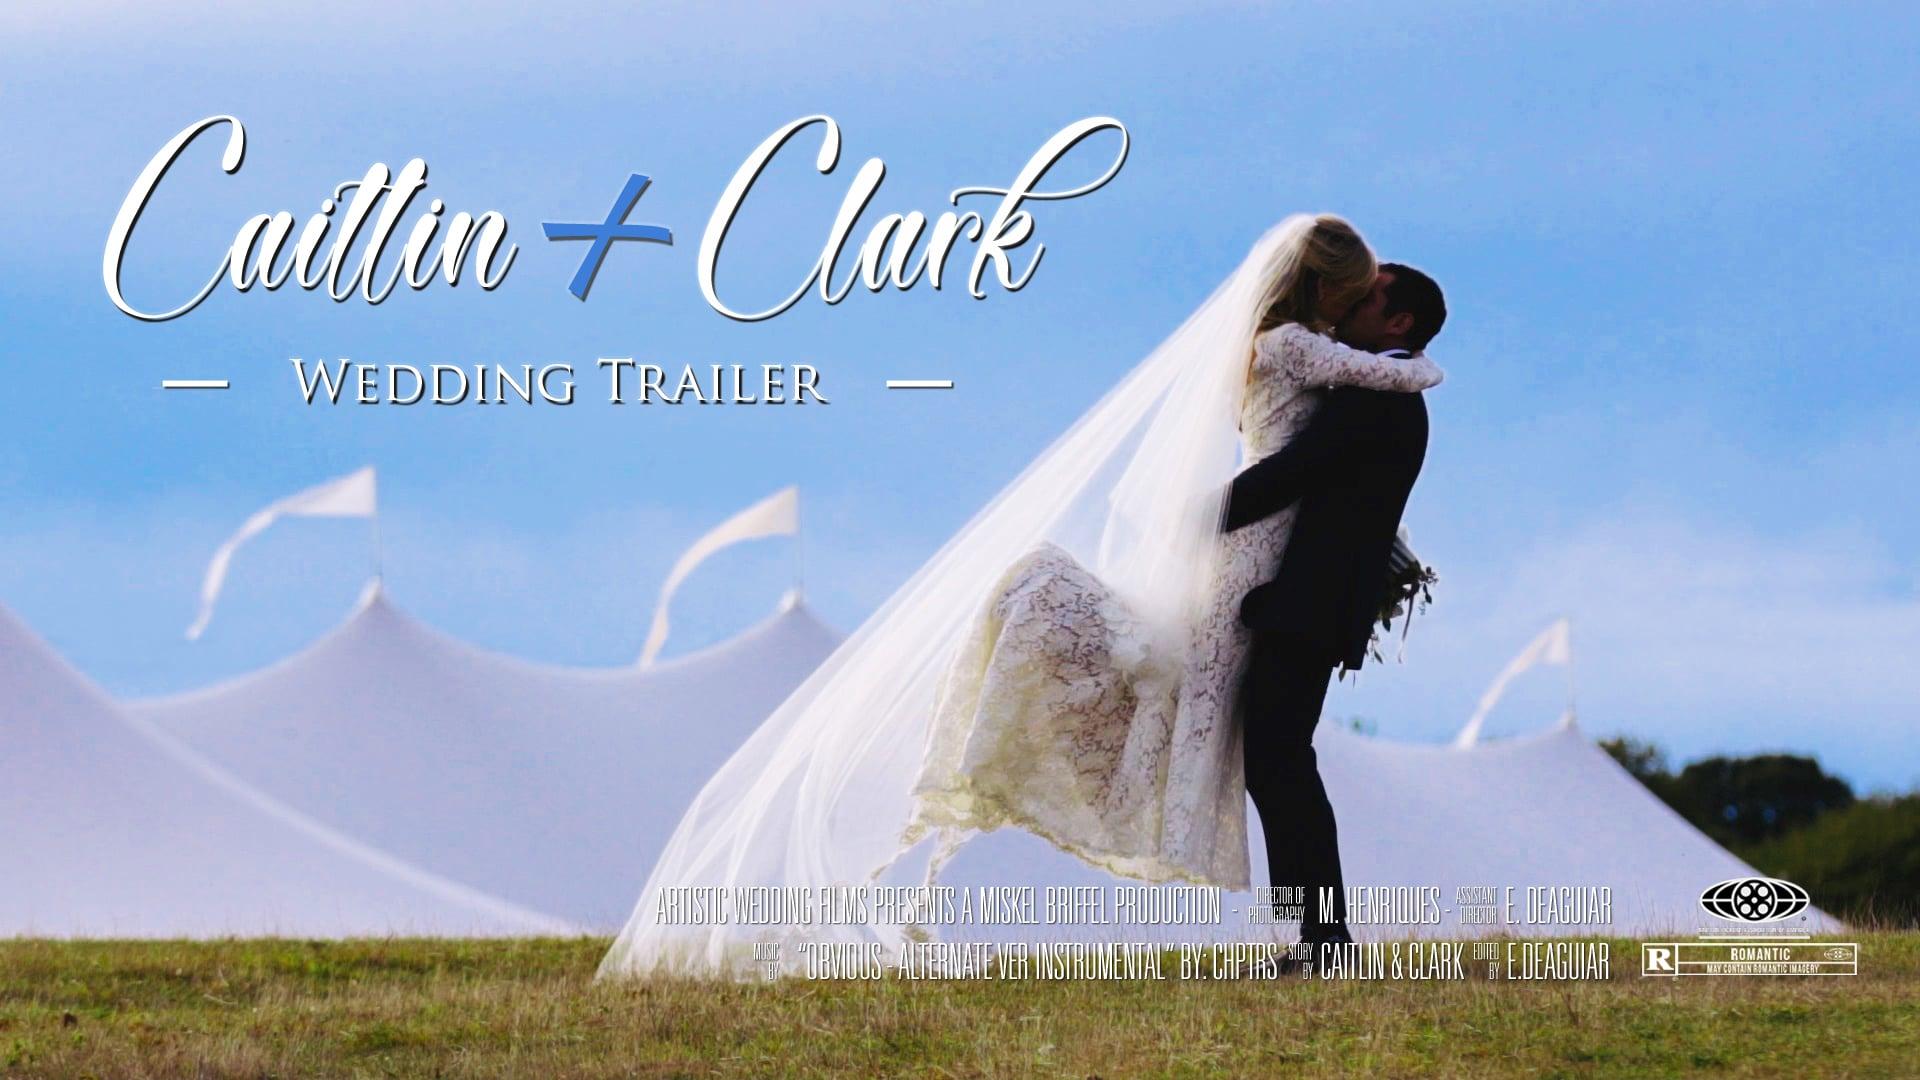 Allen Farm Weddings // Caitlin & Clark's Wedding Trailer // Martha's Vineyard Wedding